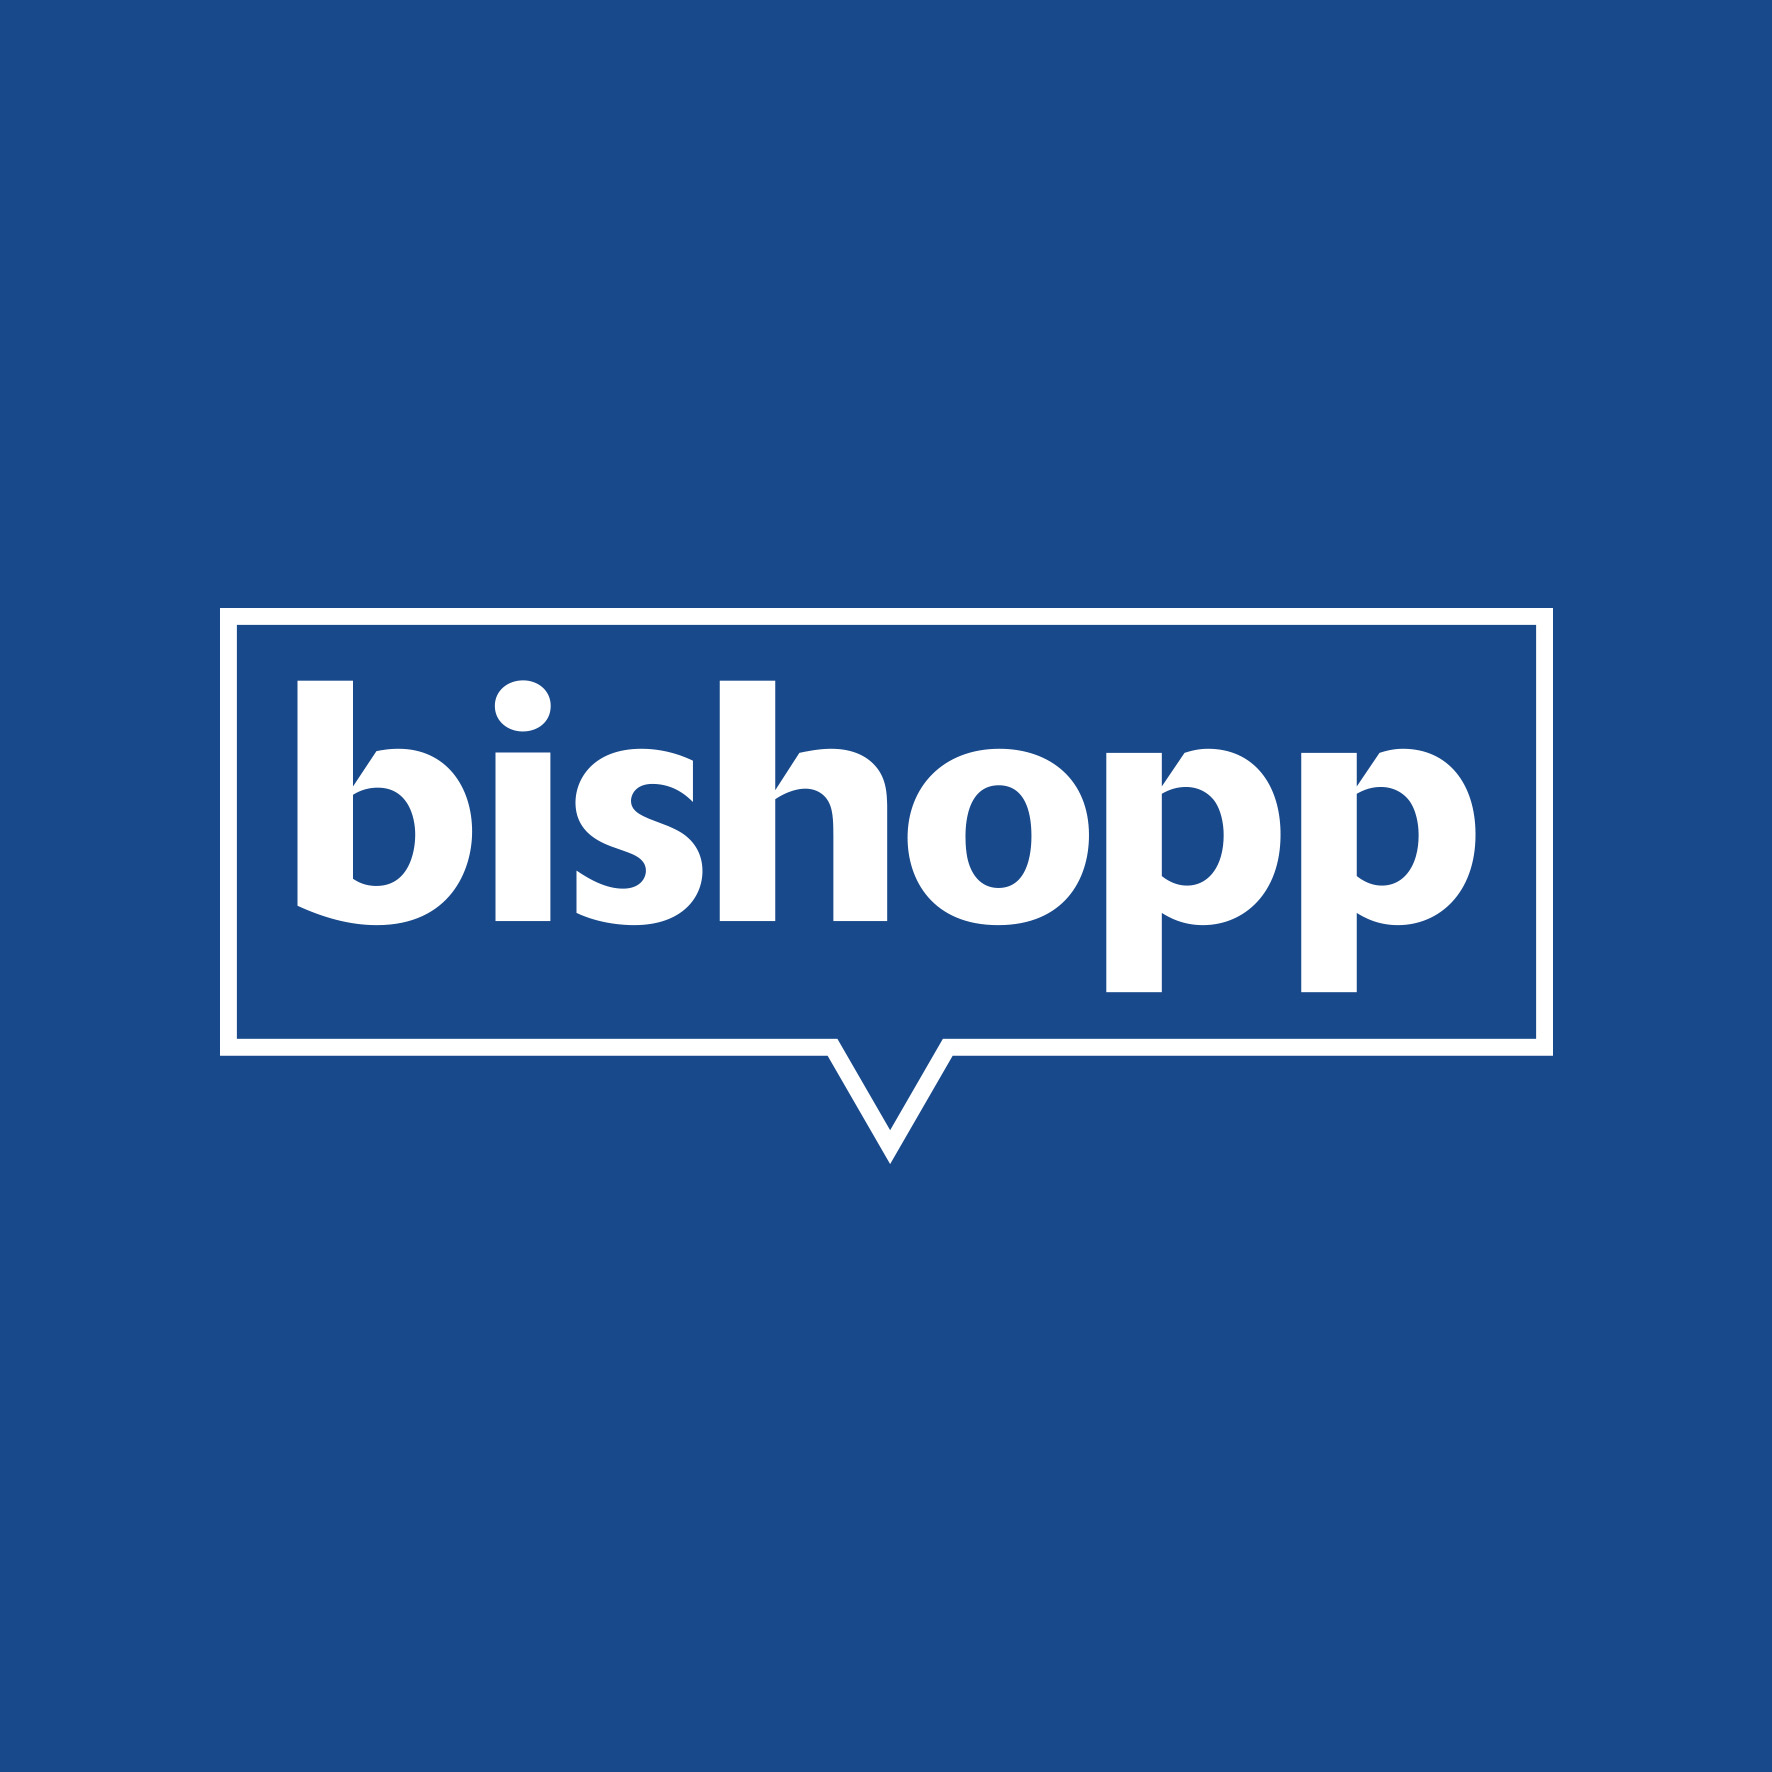 Bishopp Outdoor Advertising Pty Ltd - Kelvin Grove, QLD 4059 - (07) 3552 5600   ShowMeLocal.com